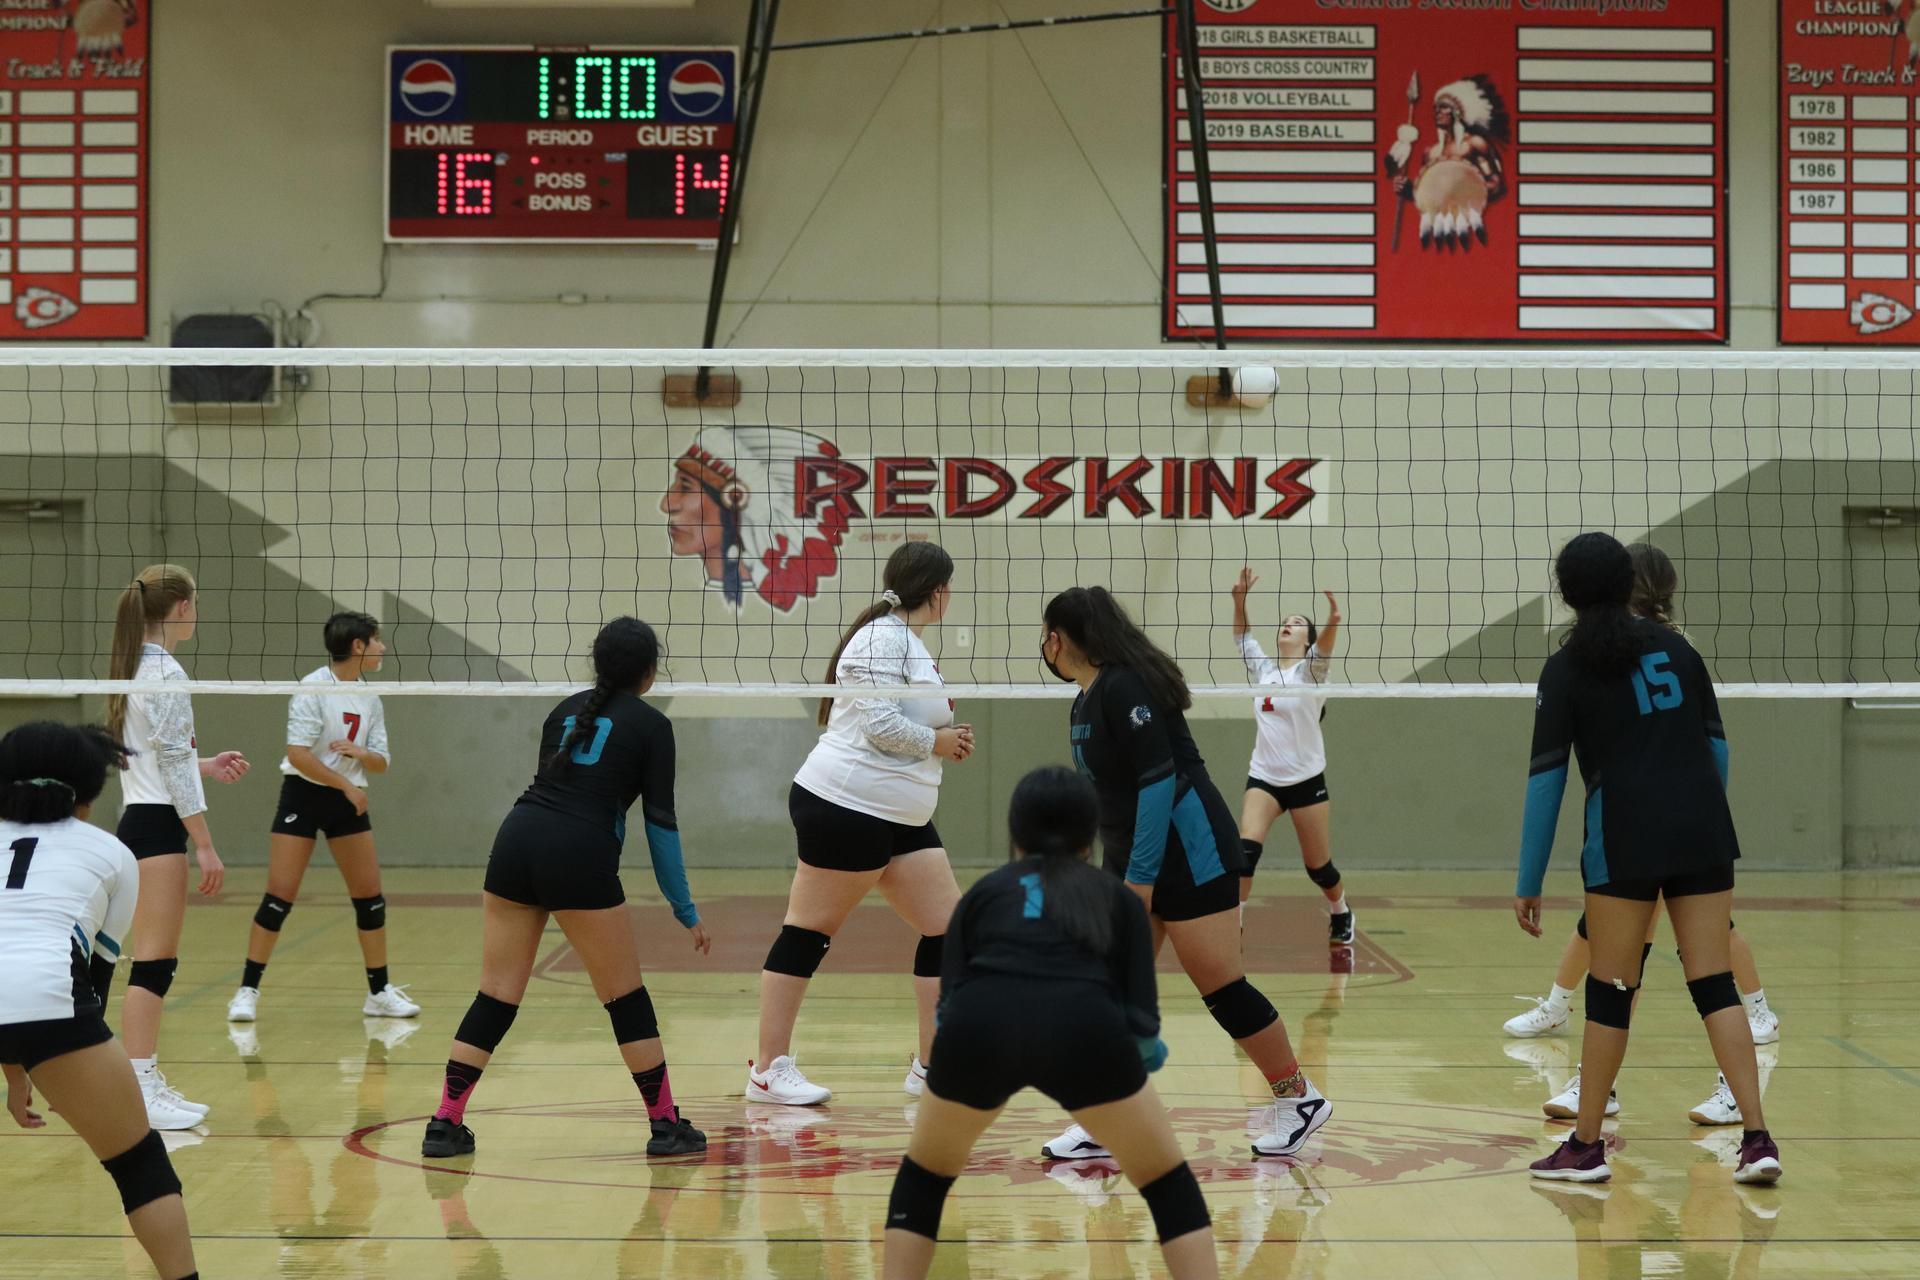 JV girls playing volleyball against Mendota